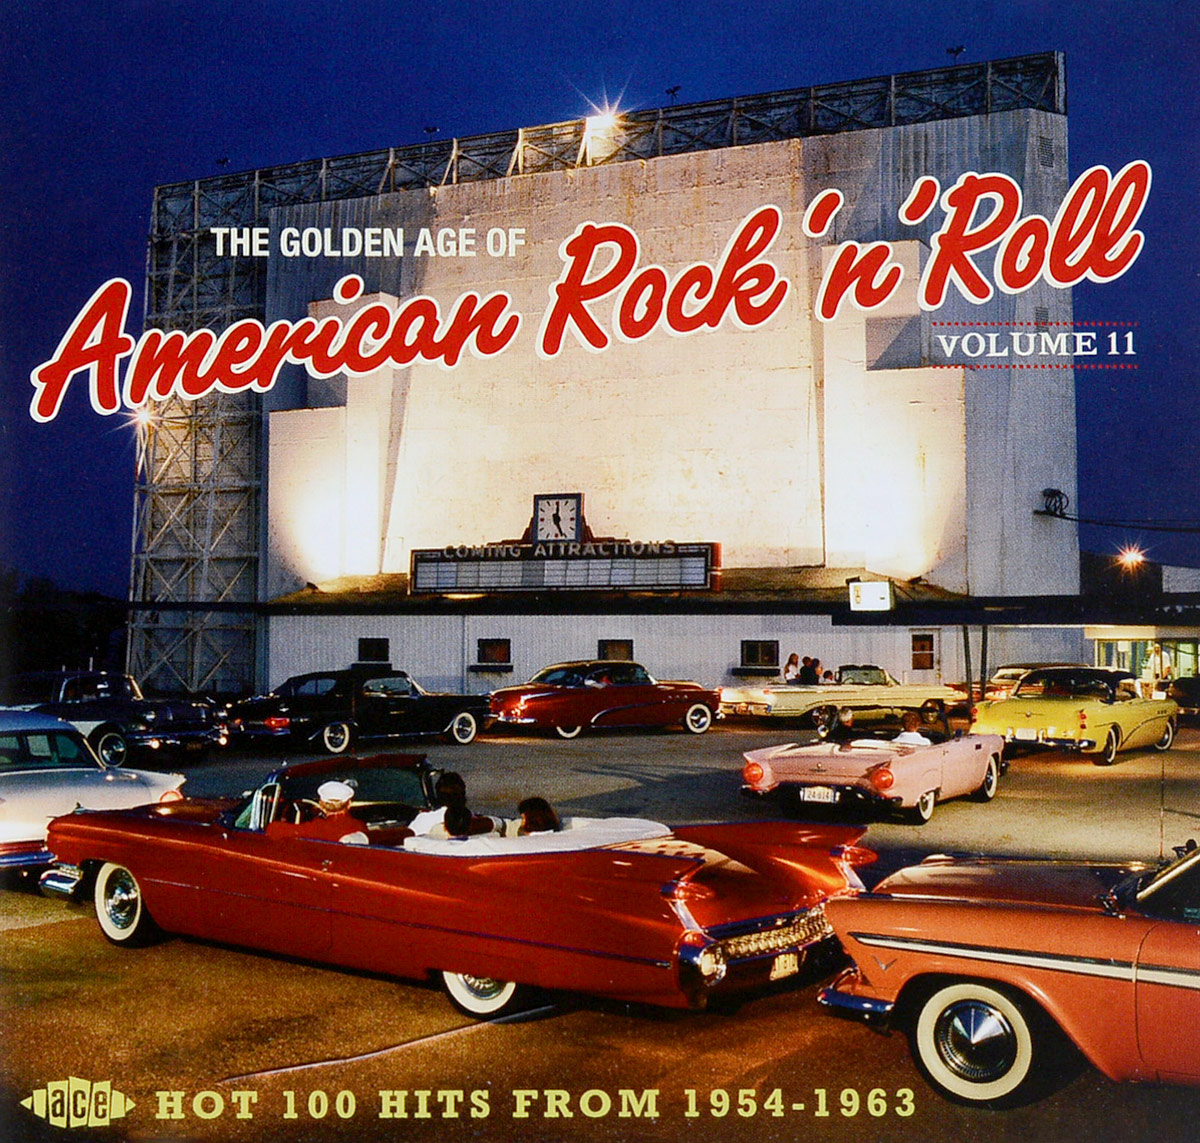 цены на The Golden Age Of American Rock'n'roll Vol. 11  в интернет-магазинах